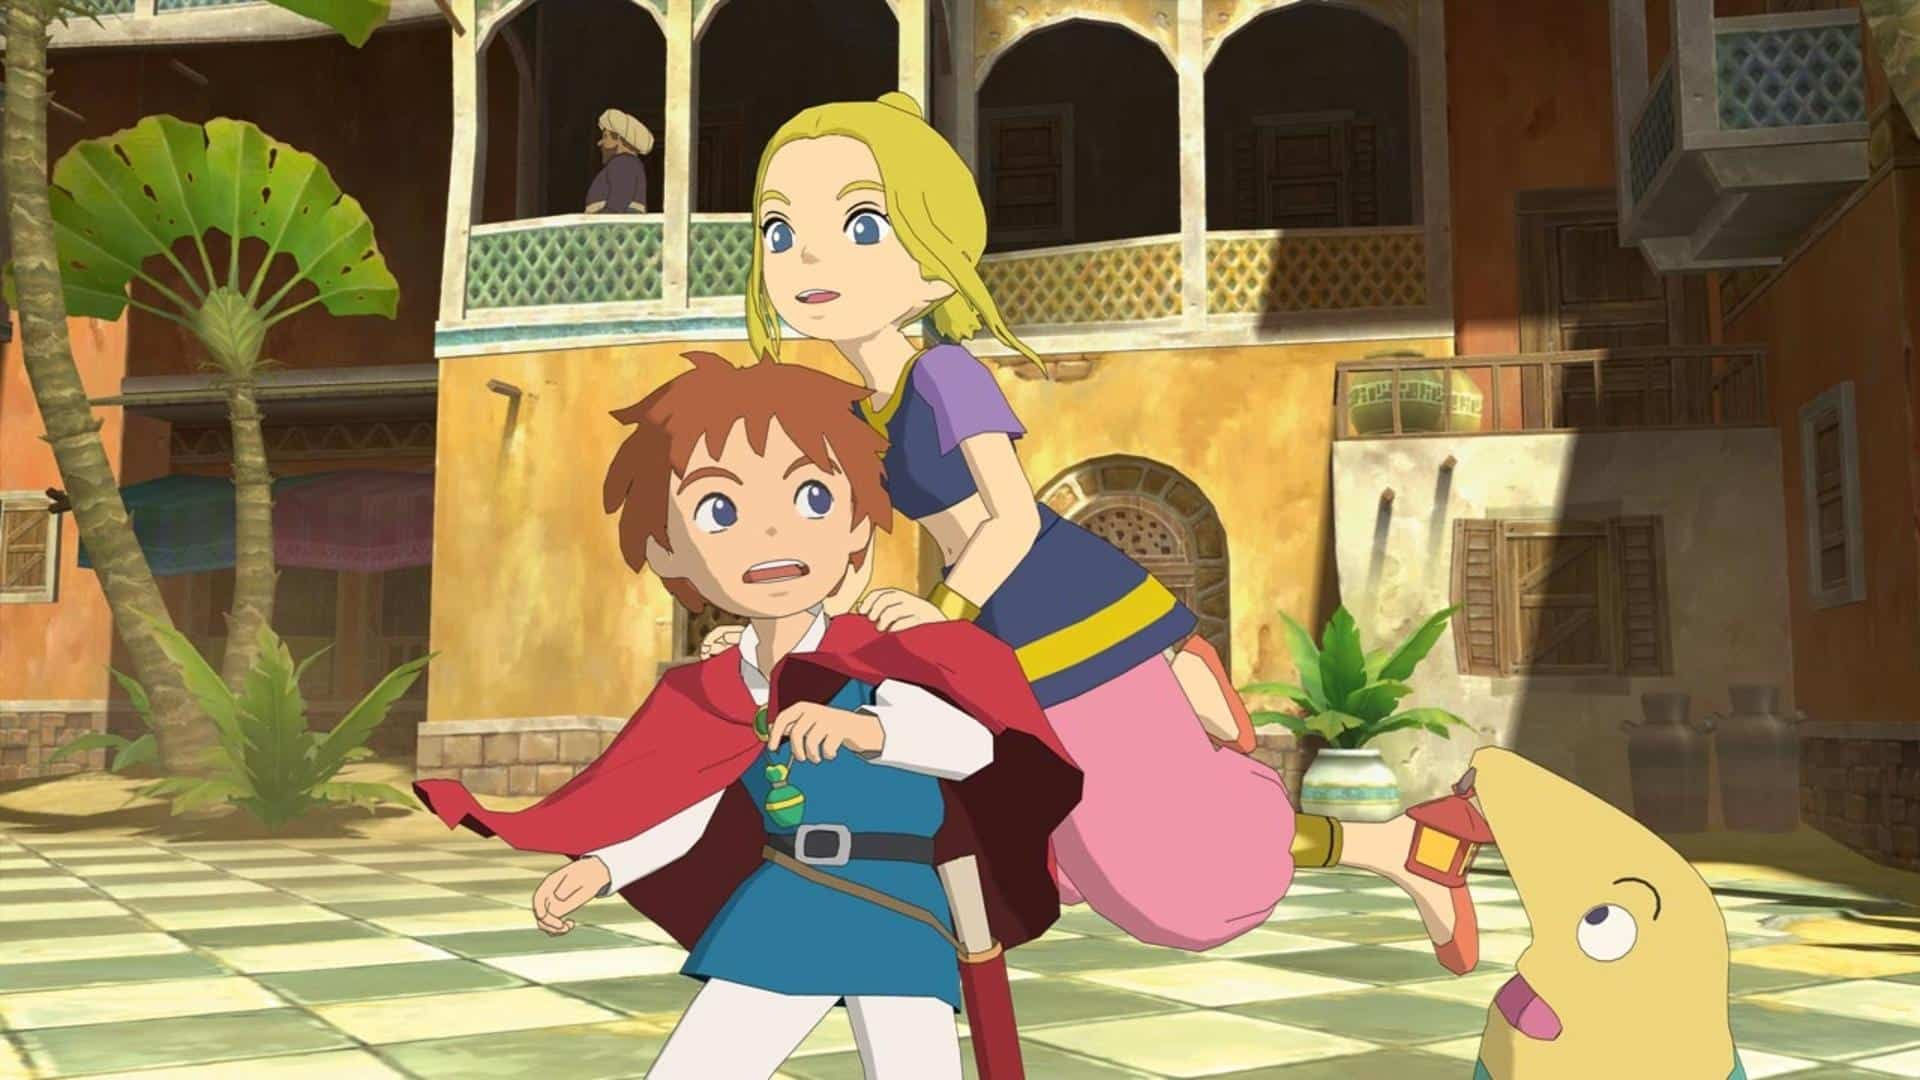 Level-5 modern fairy tale Ni no Kuni: Wrath of the White Witch Ni no Kuni II: Revenant Kingdom fairy tales for kids teaching moral lessons